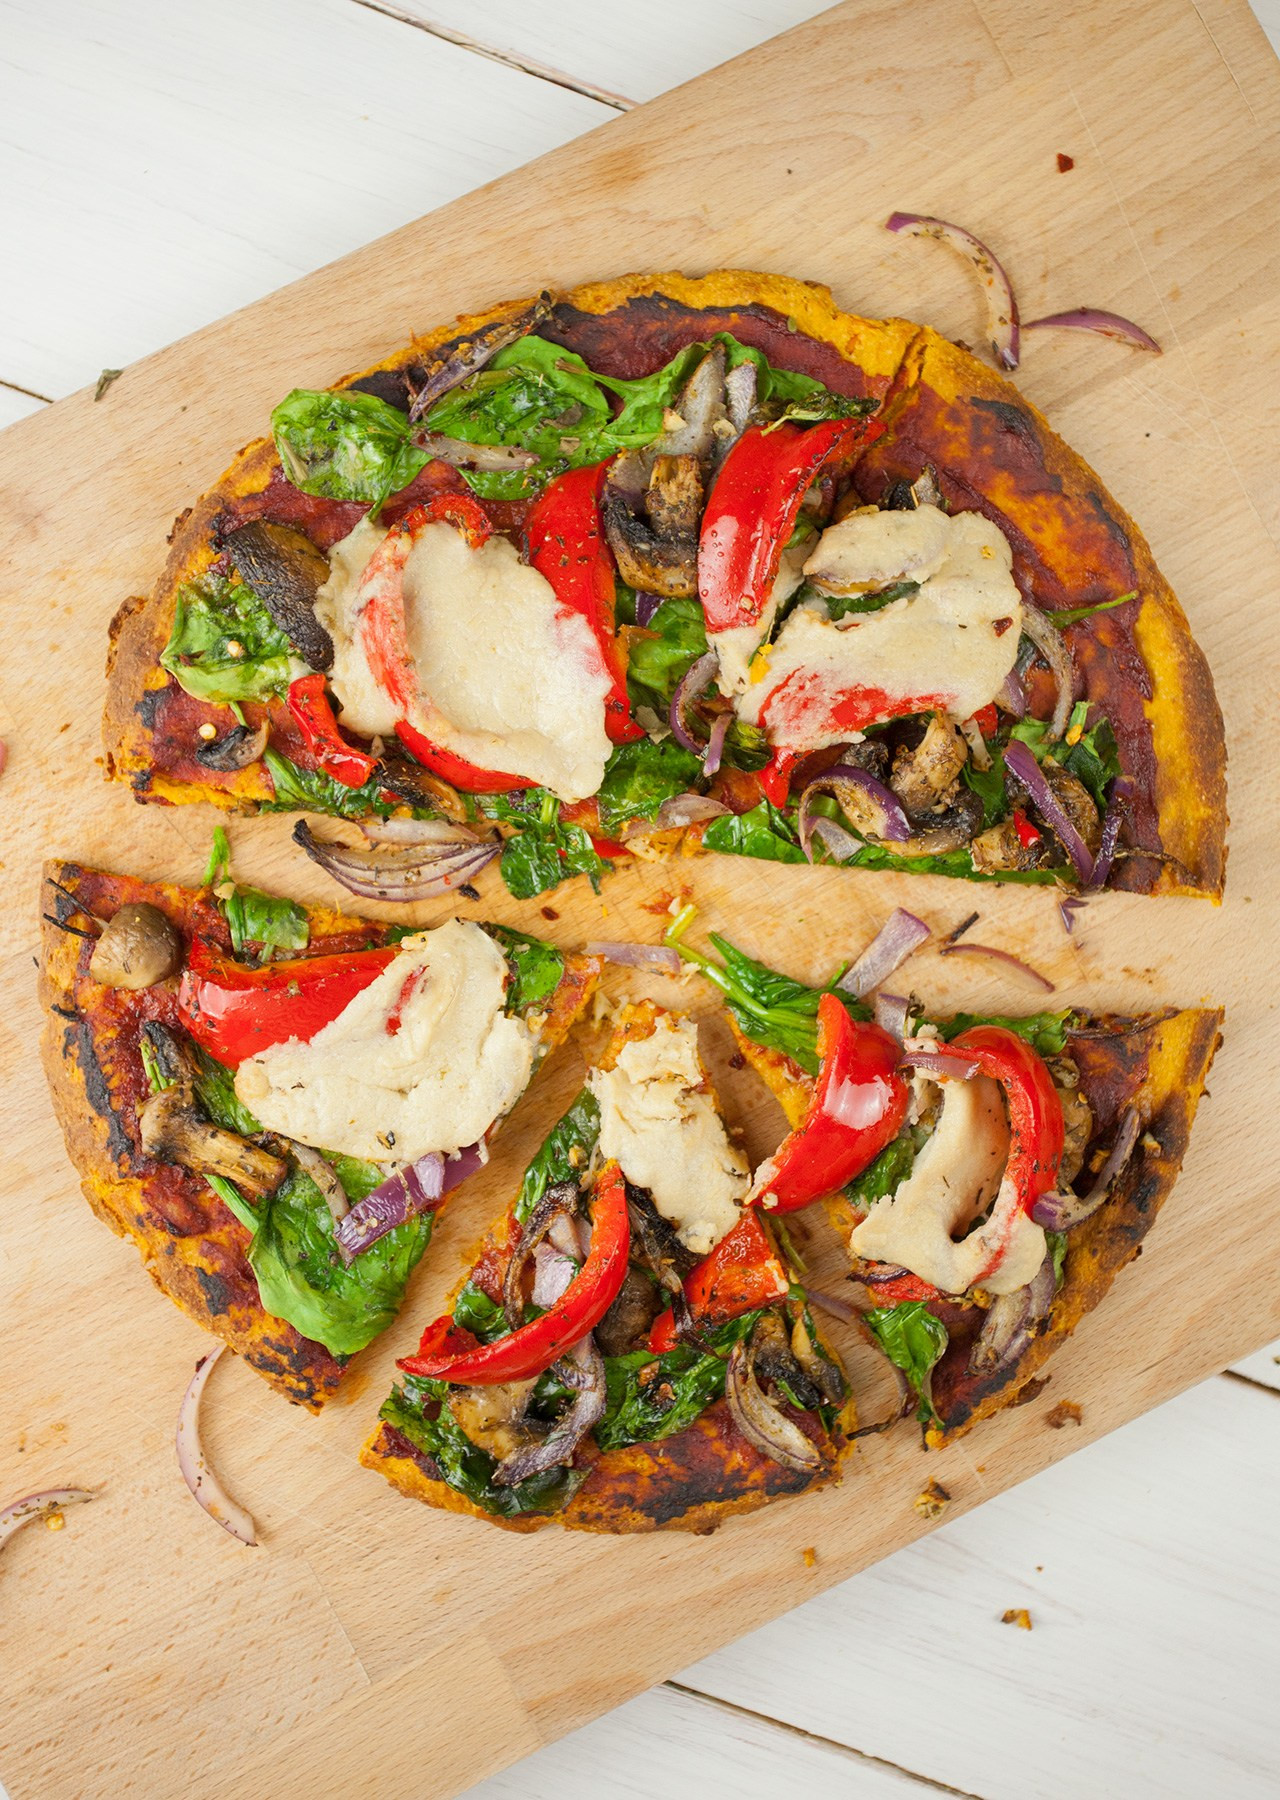 Sweet Potato Pizza  15 Low Carb Vegan Healthy Pizza Crust Recipes